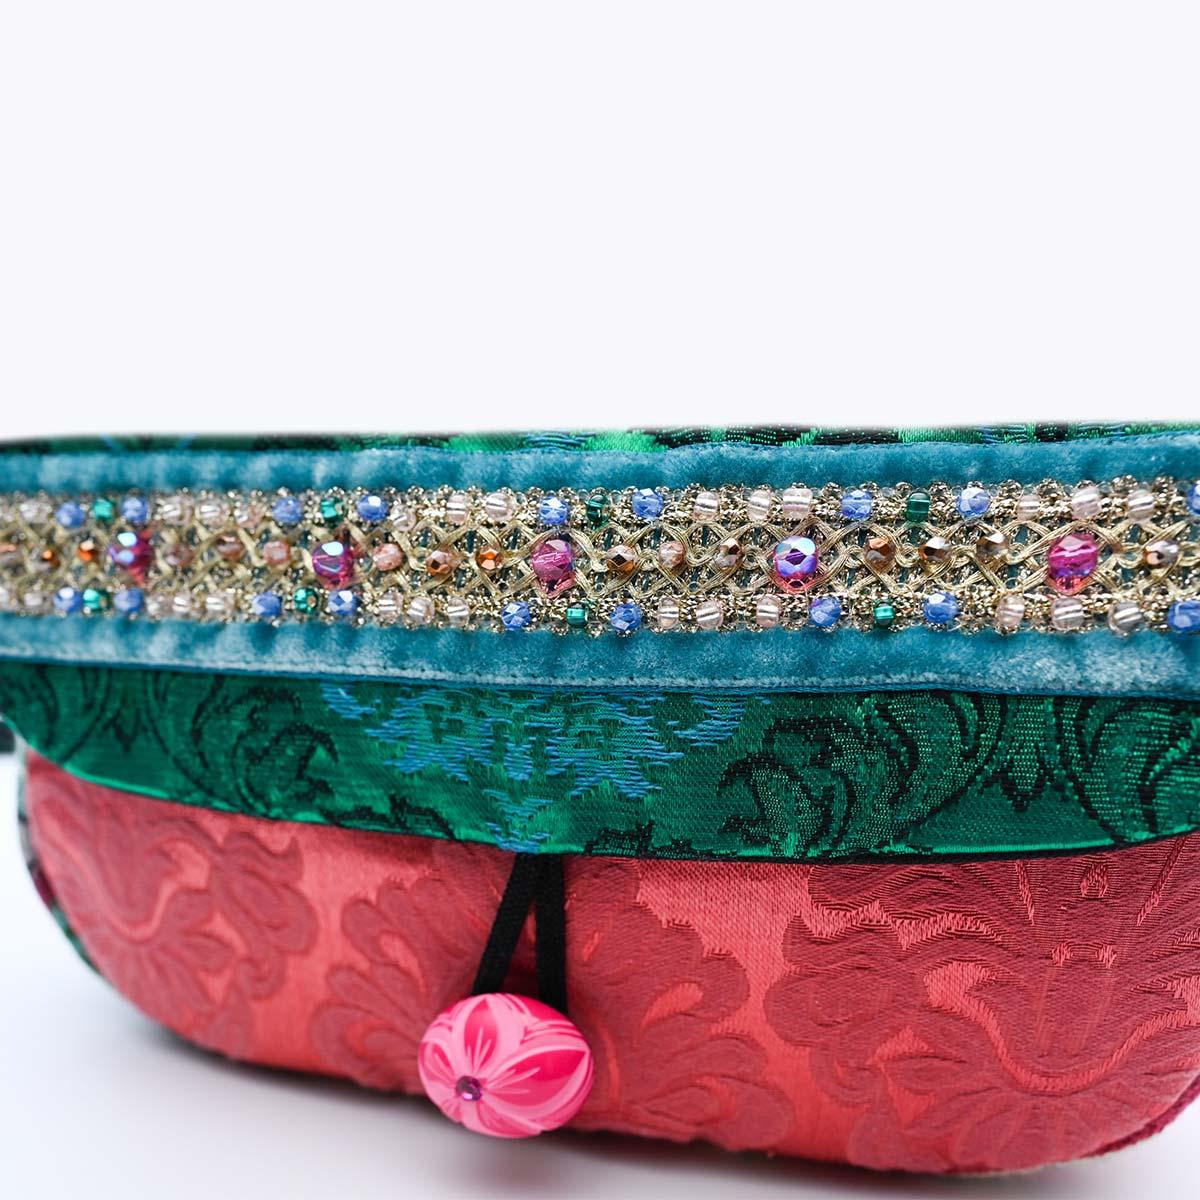 cruise bag teal pink DSC 6354